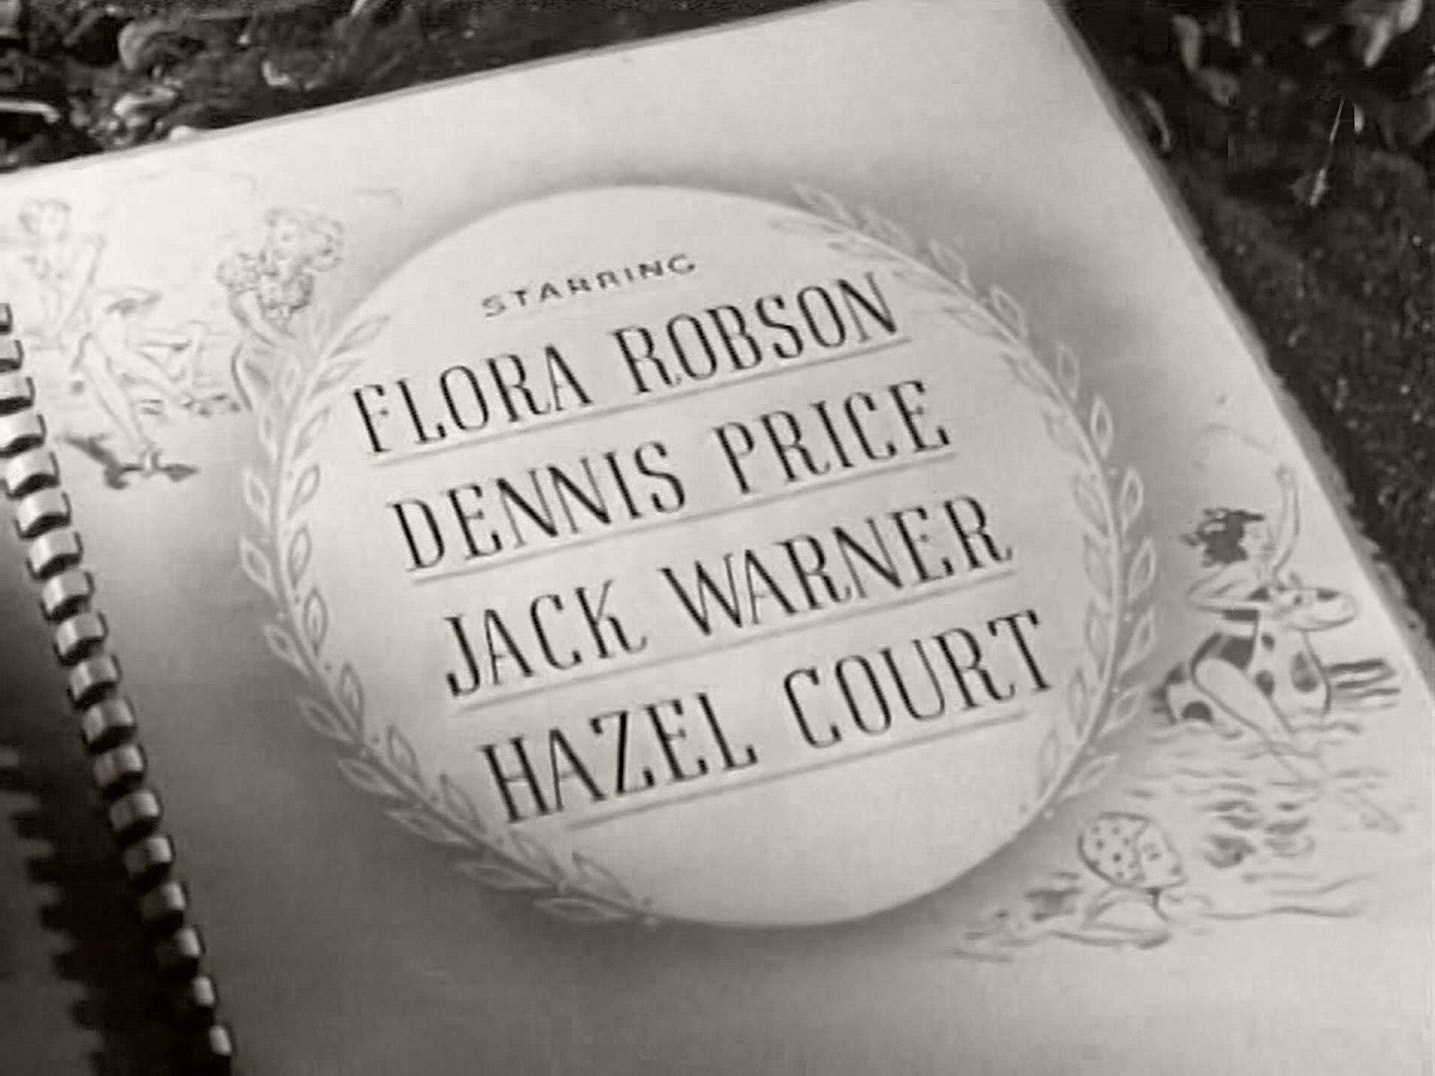 Main title from Holiday Camp (1947) (4).  Starring Flora Robson Dennis Price. Jack Warner Hazel Court